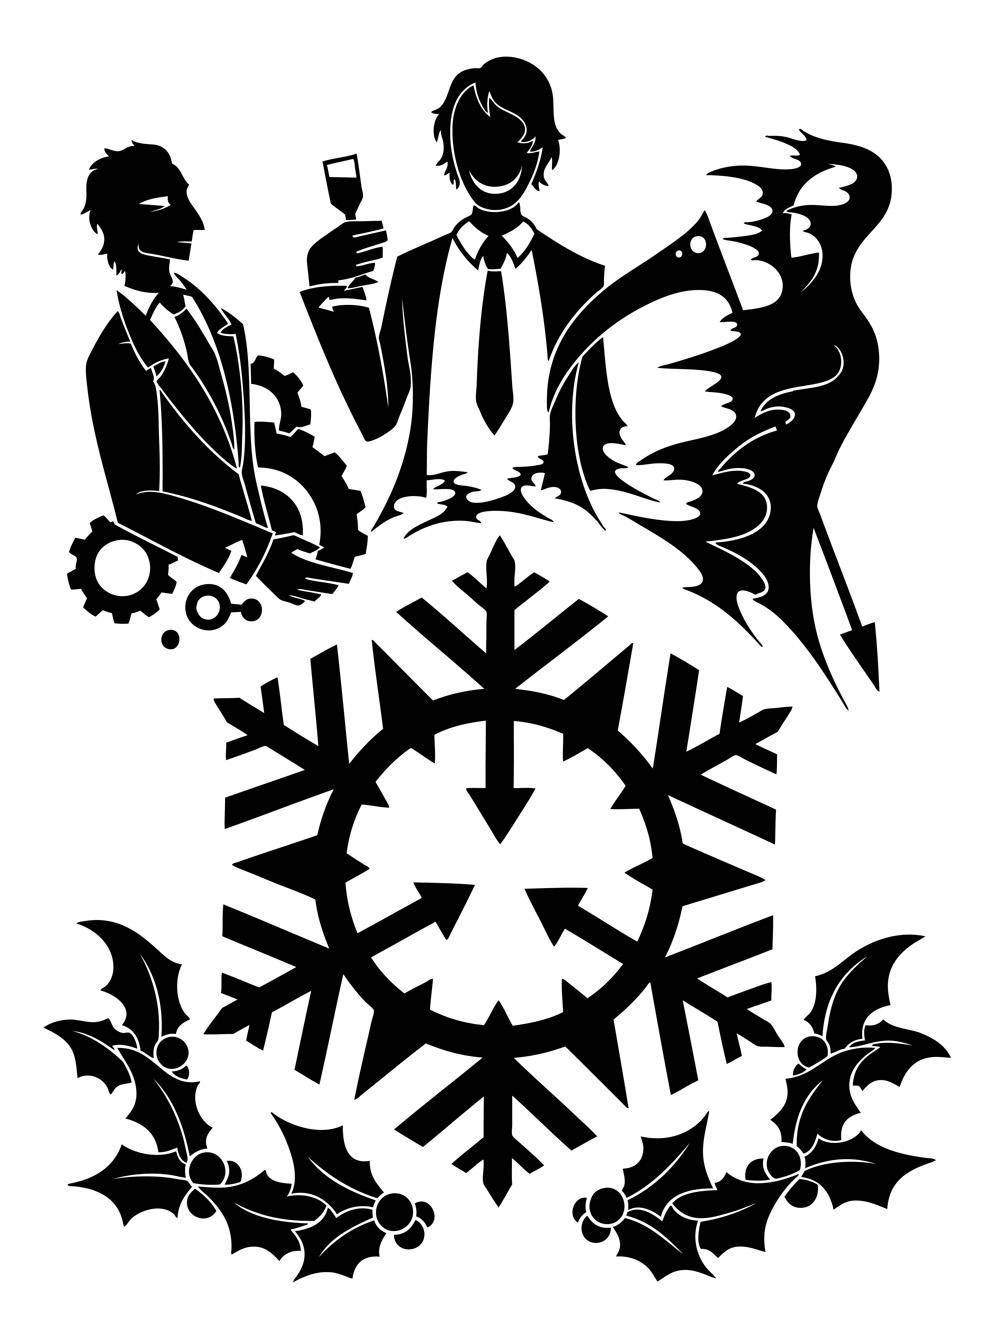 a_site_19_christmas_carol_by_sunnyclockwork-d9k40qh.jpg